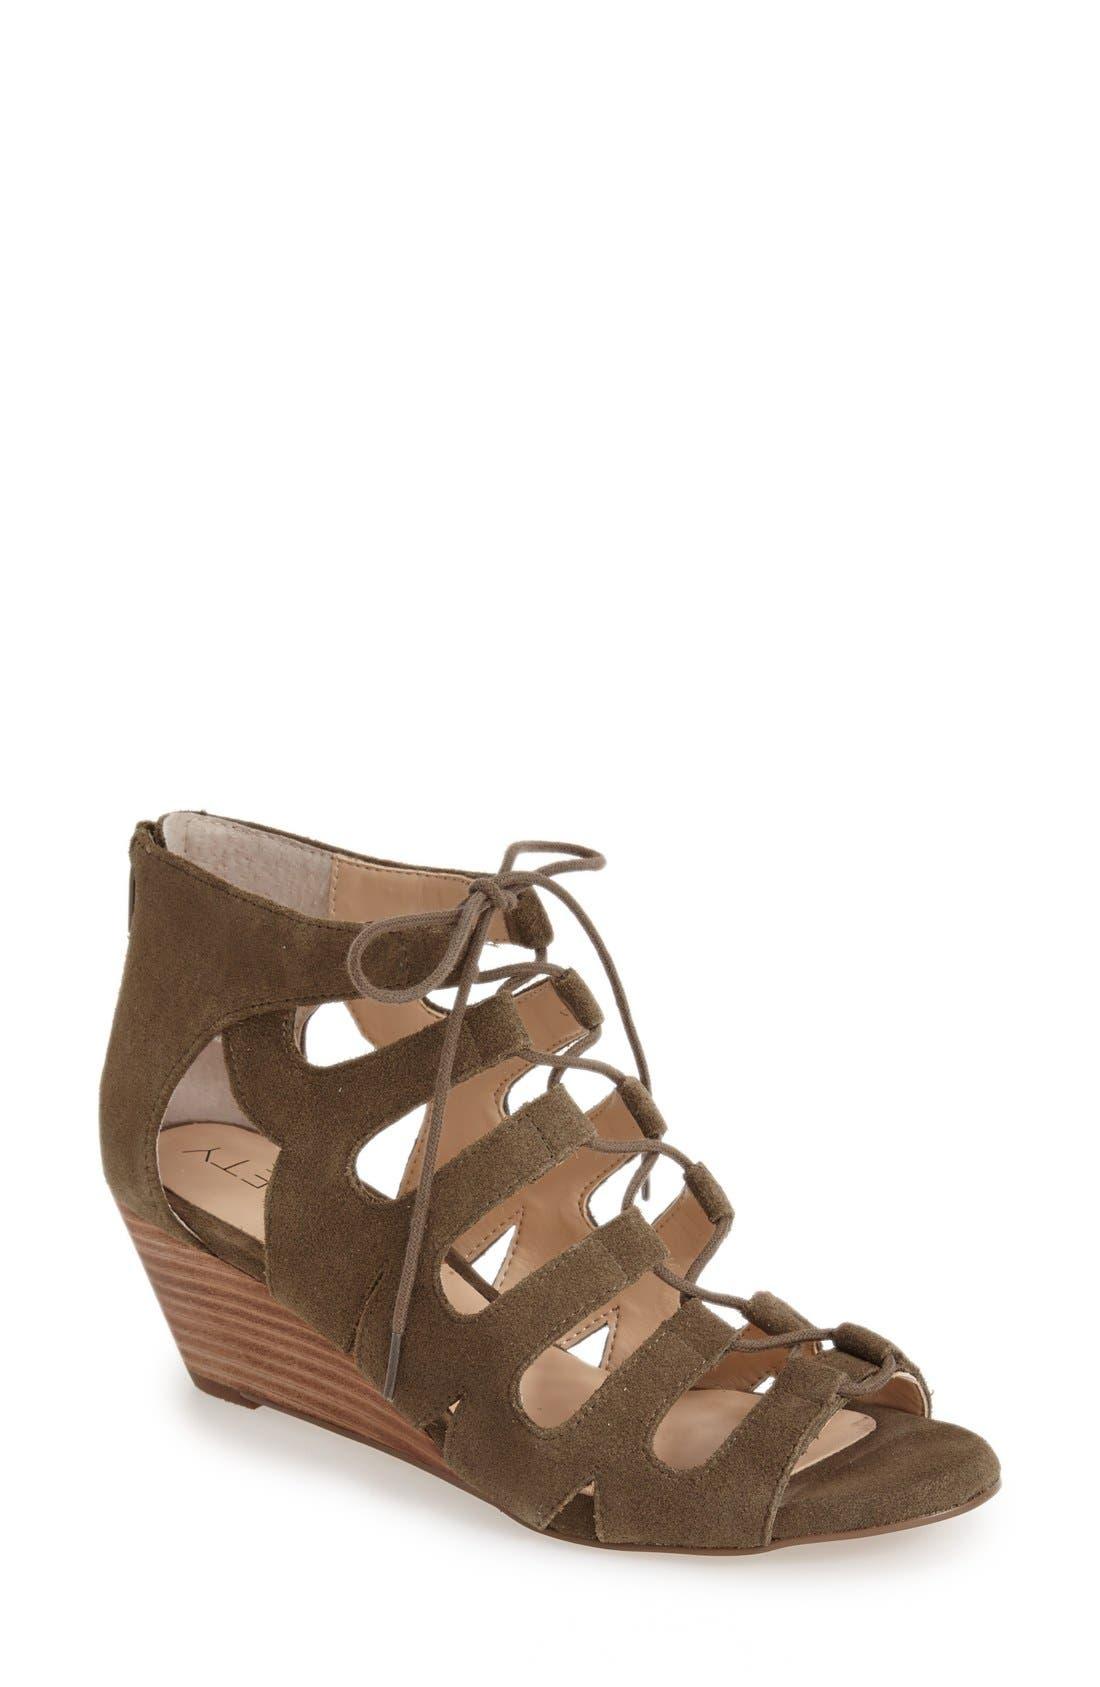 Alternate Image 1 Selected - Sole Society 'Freyaa' Wedge Sandal (Women)